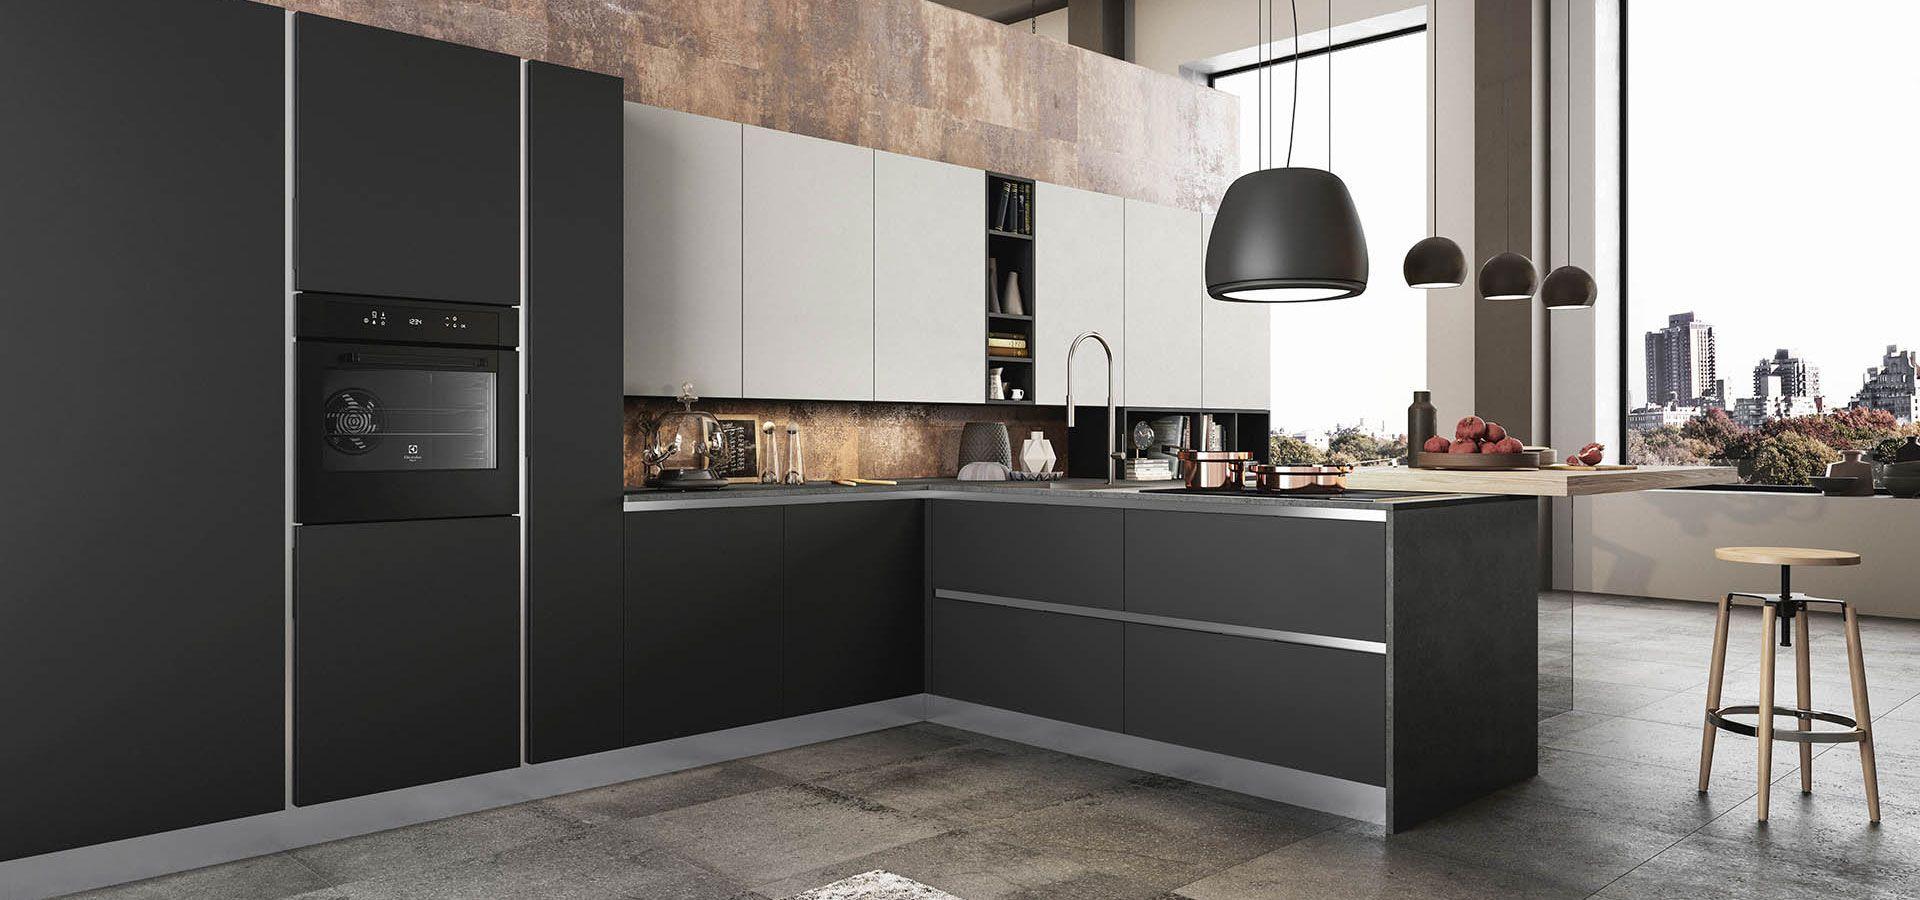 Cucina Moderna - Time Finiture: nero opaco, nebbia opaco | Top ...